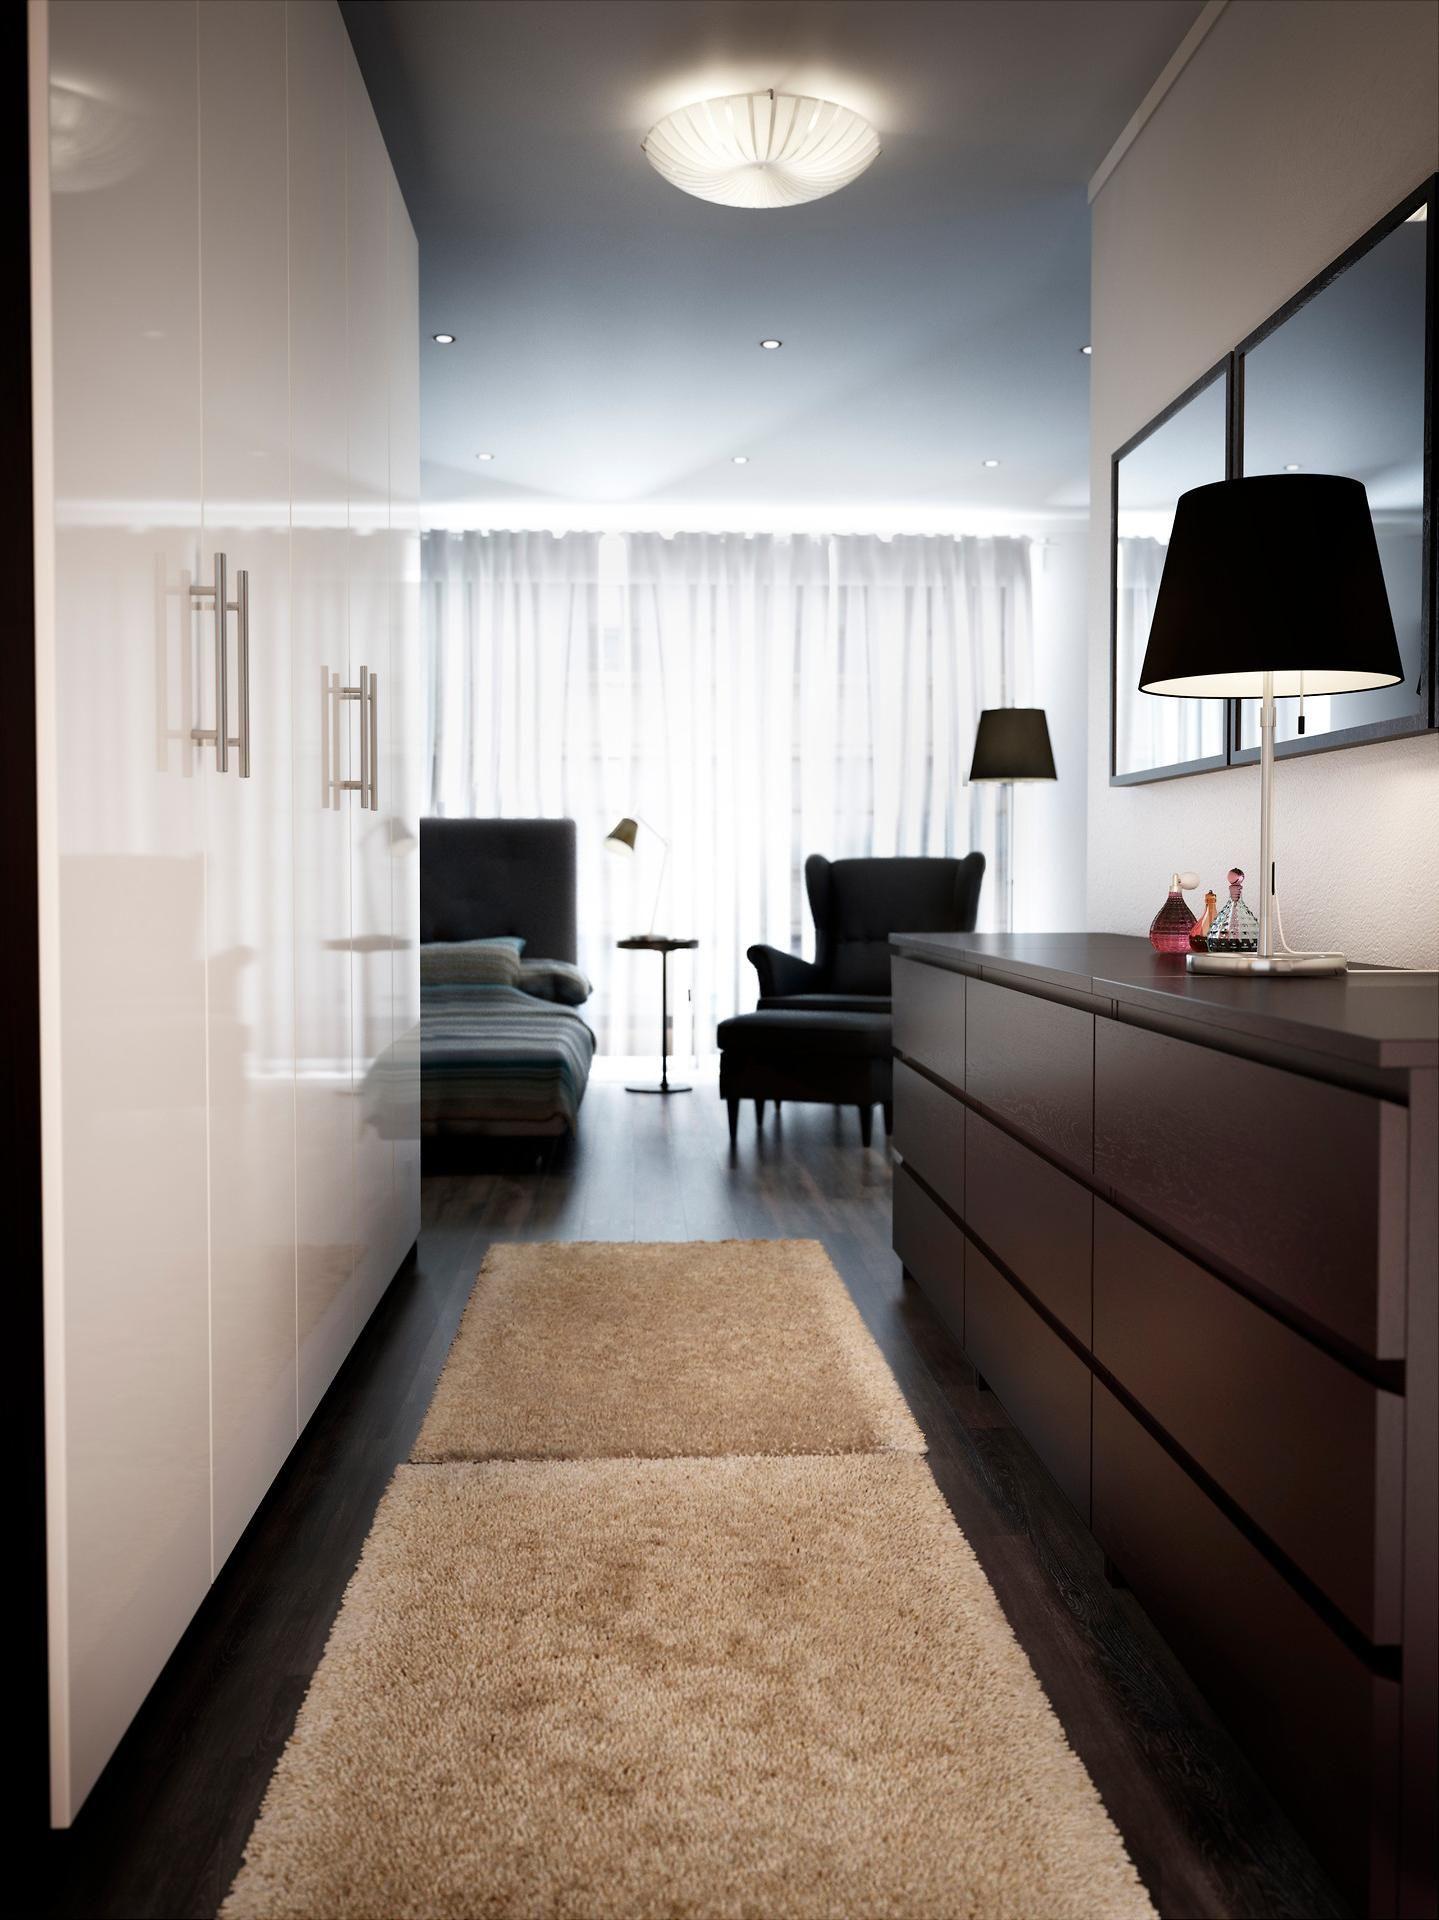 66a075bfe2f6f55ab7ae06fb2f20b099 Frais De Ikea Meuble Bar Concept